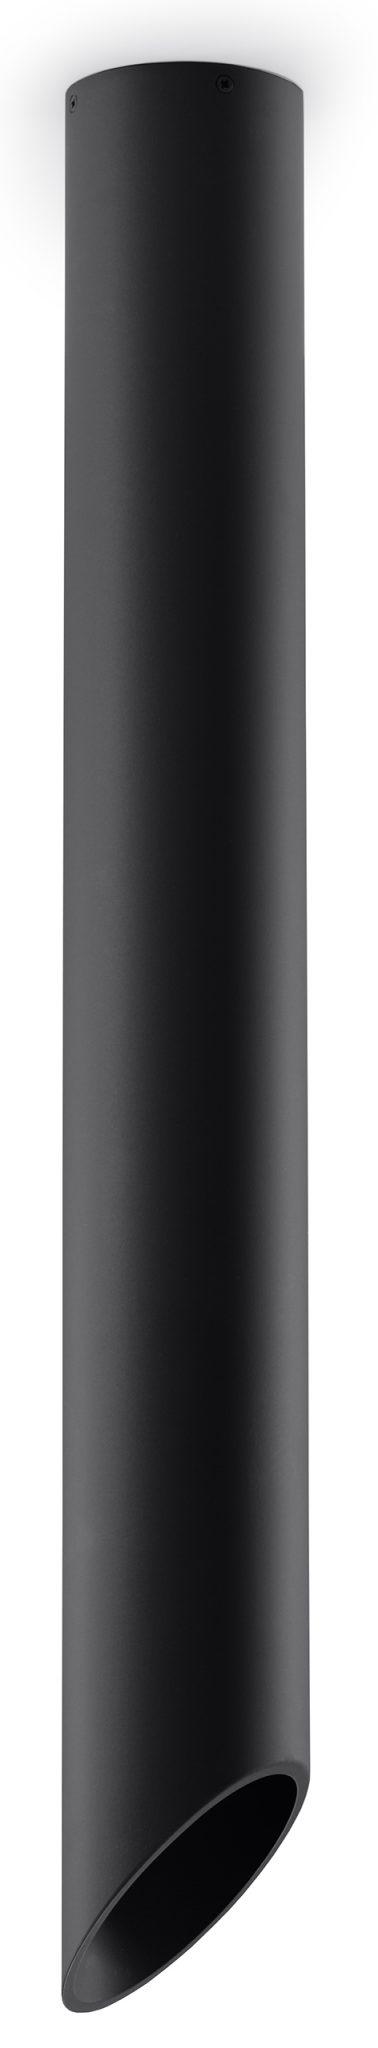 lampa w kształcie walca plafon Penne 80